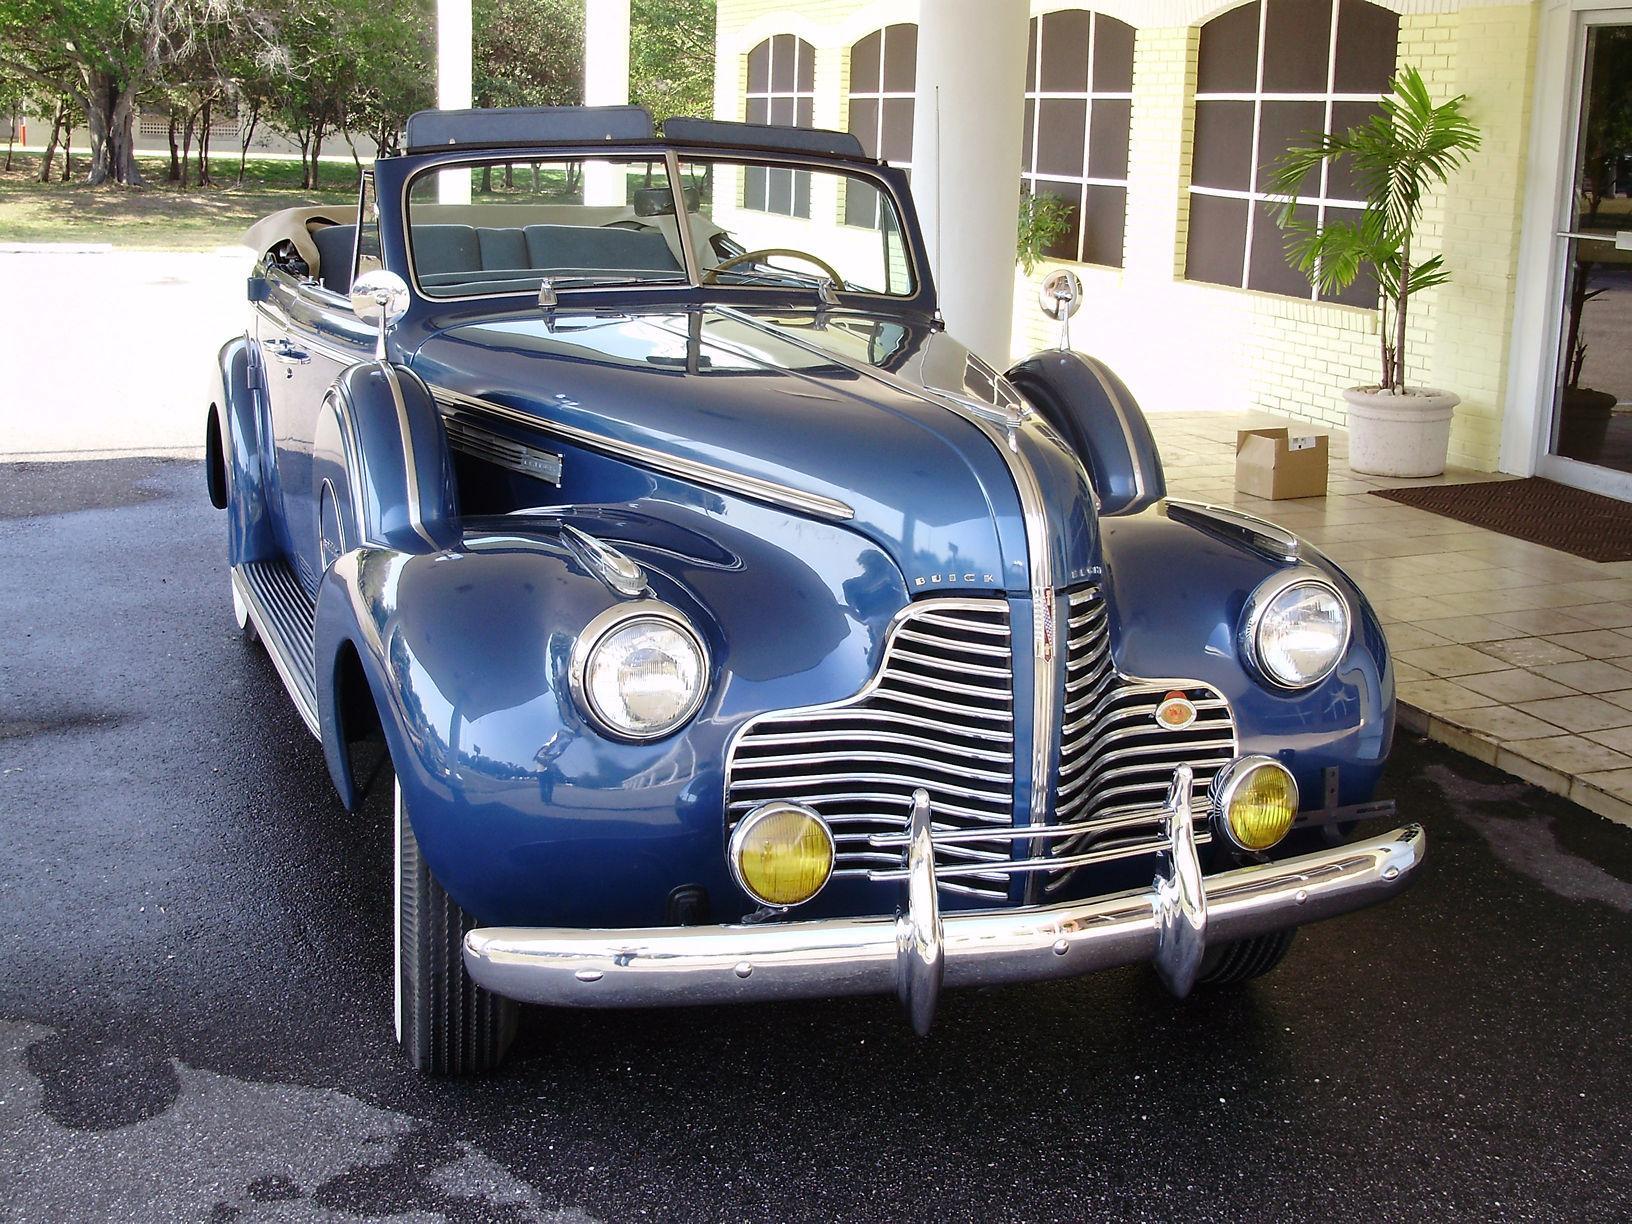 1940 BUICK CENTURY CONVERTIBLE SEDAN - Vintage Motors of Sarasota Inc. #10